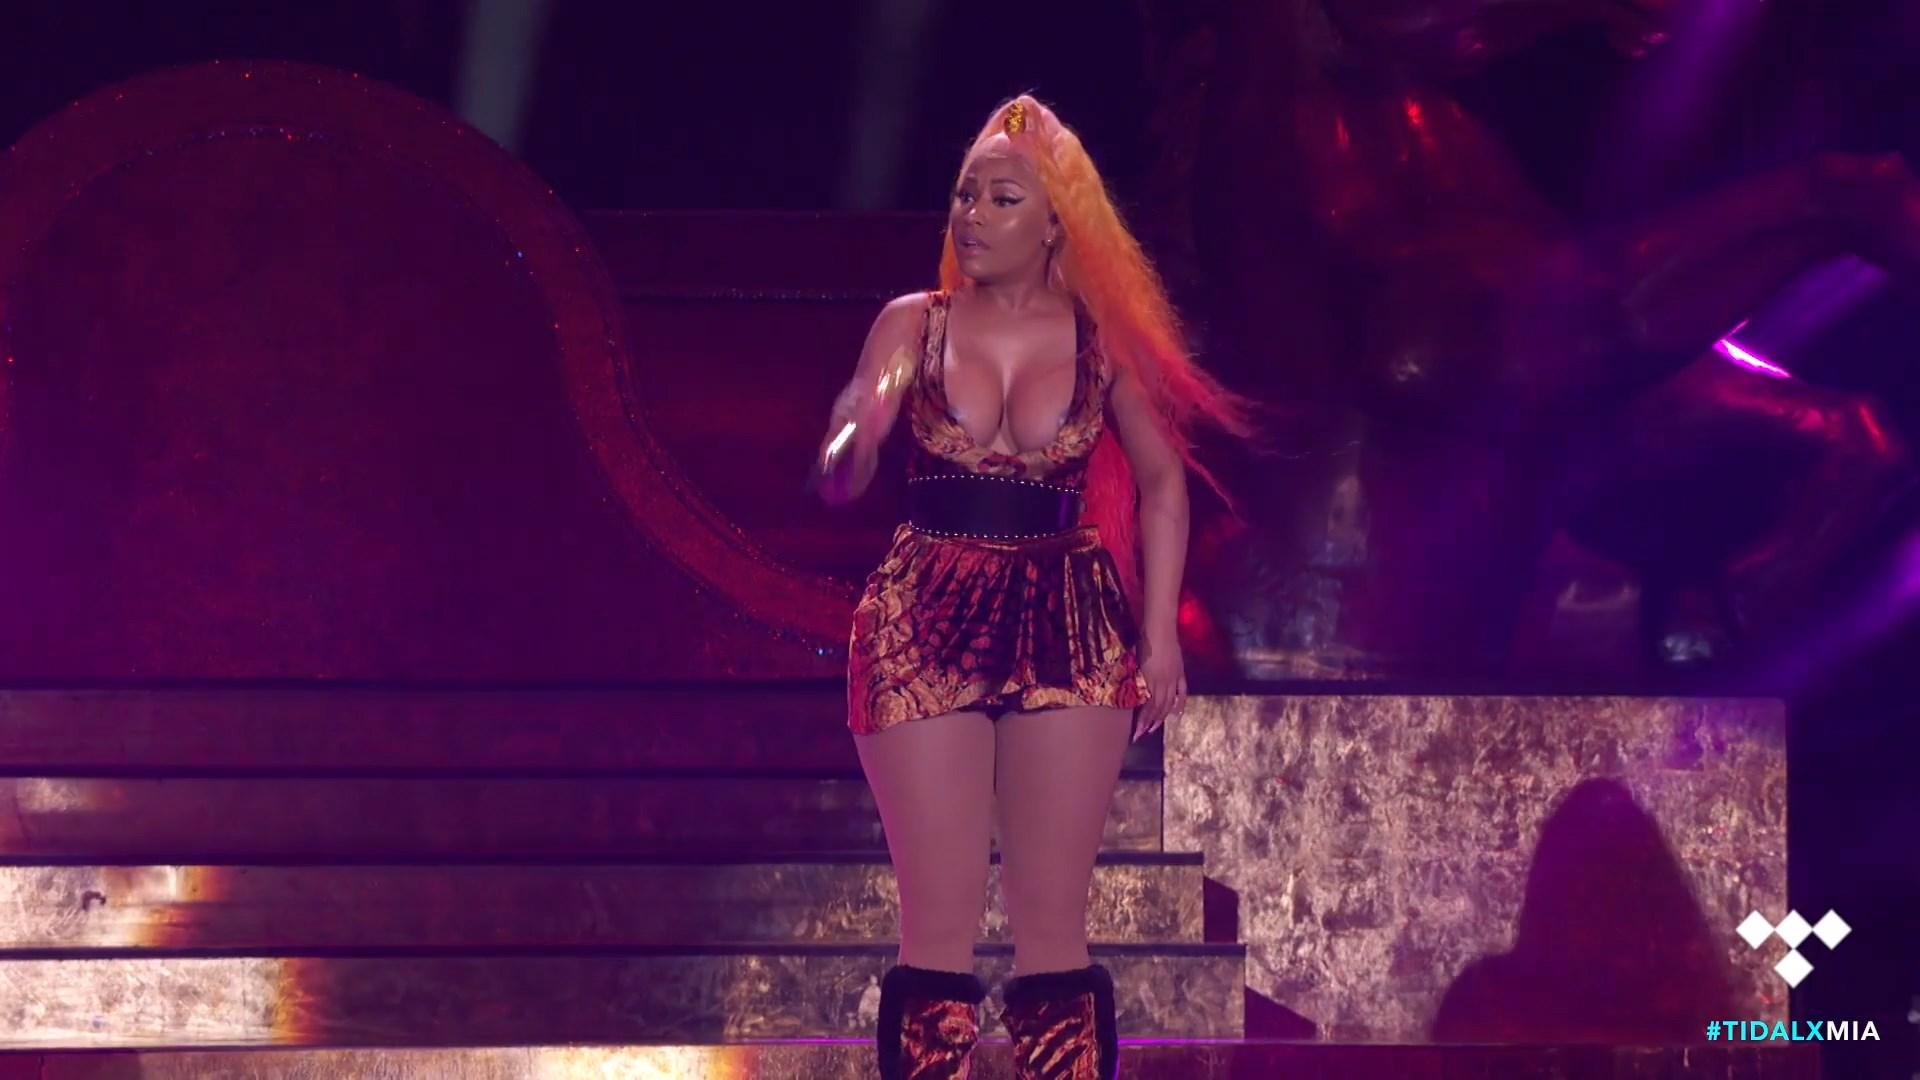 Nicki-Minaj-Nude-TheFappeningBlog.com-26.jpg